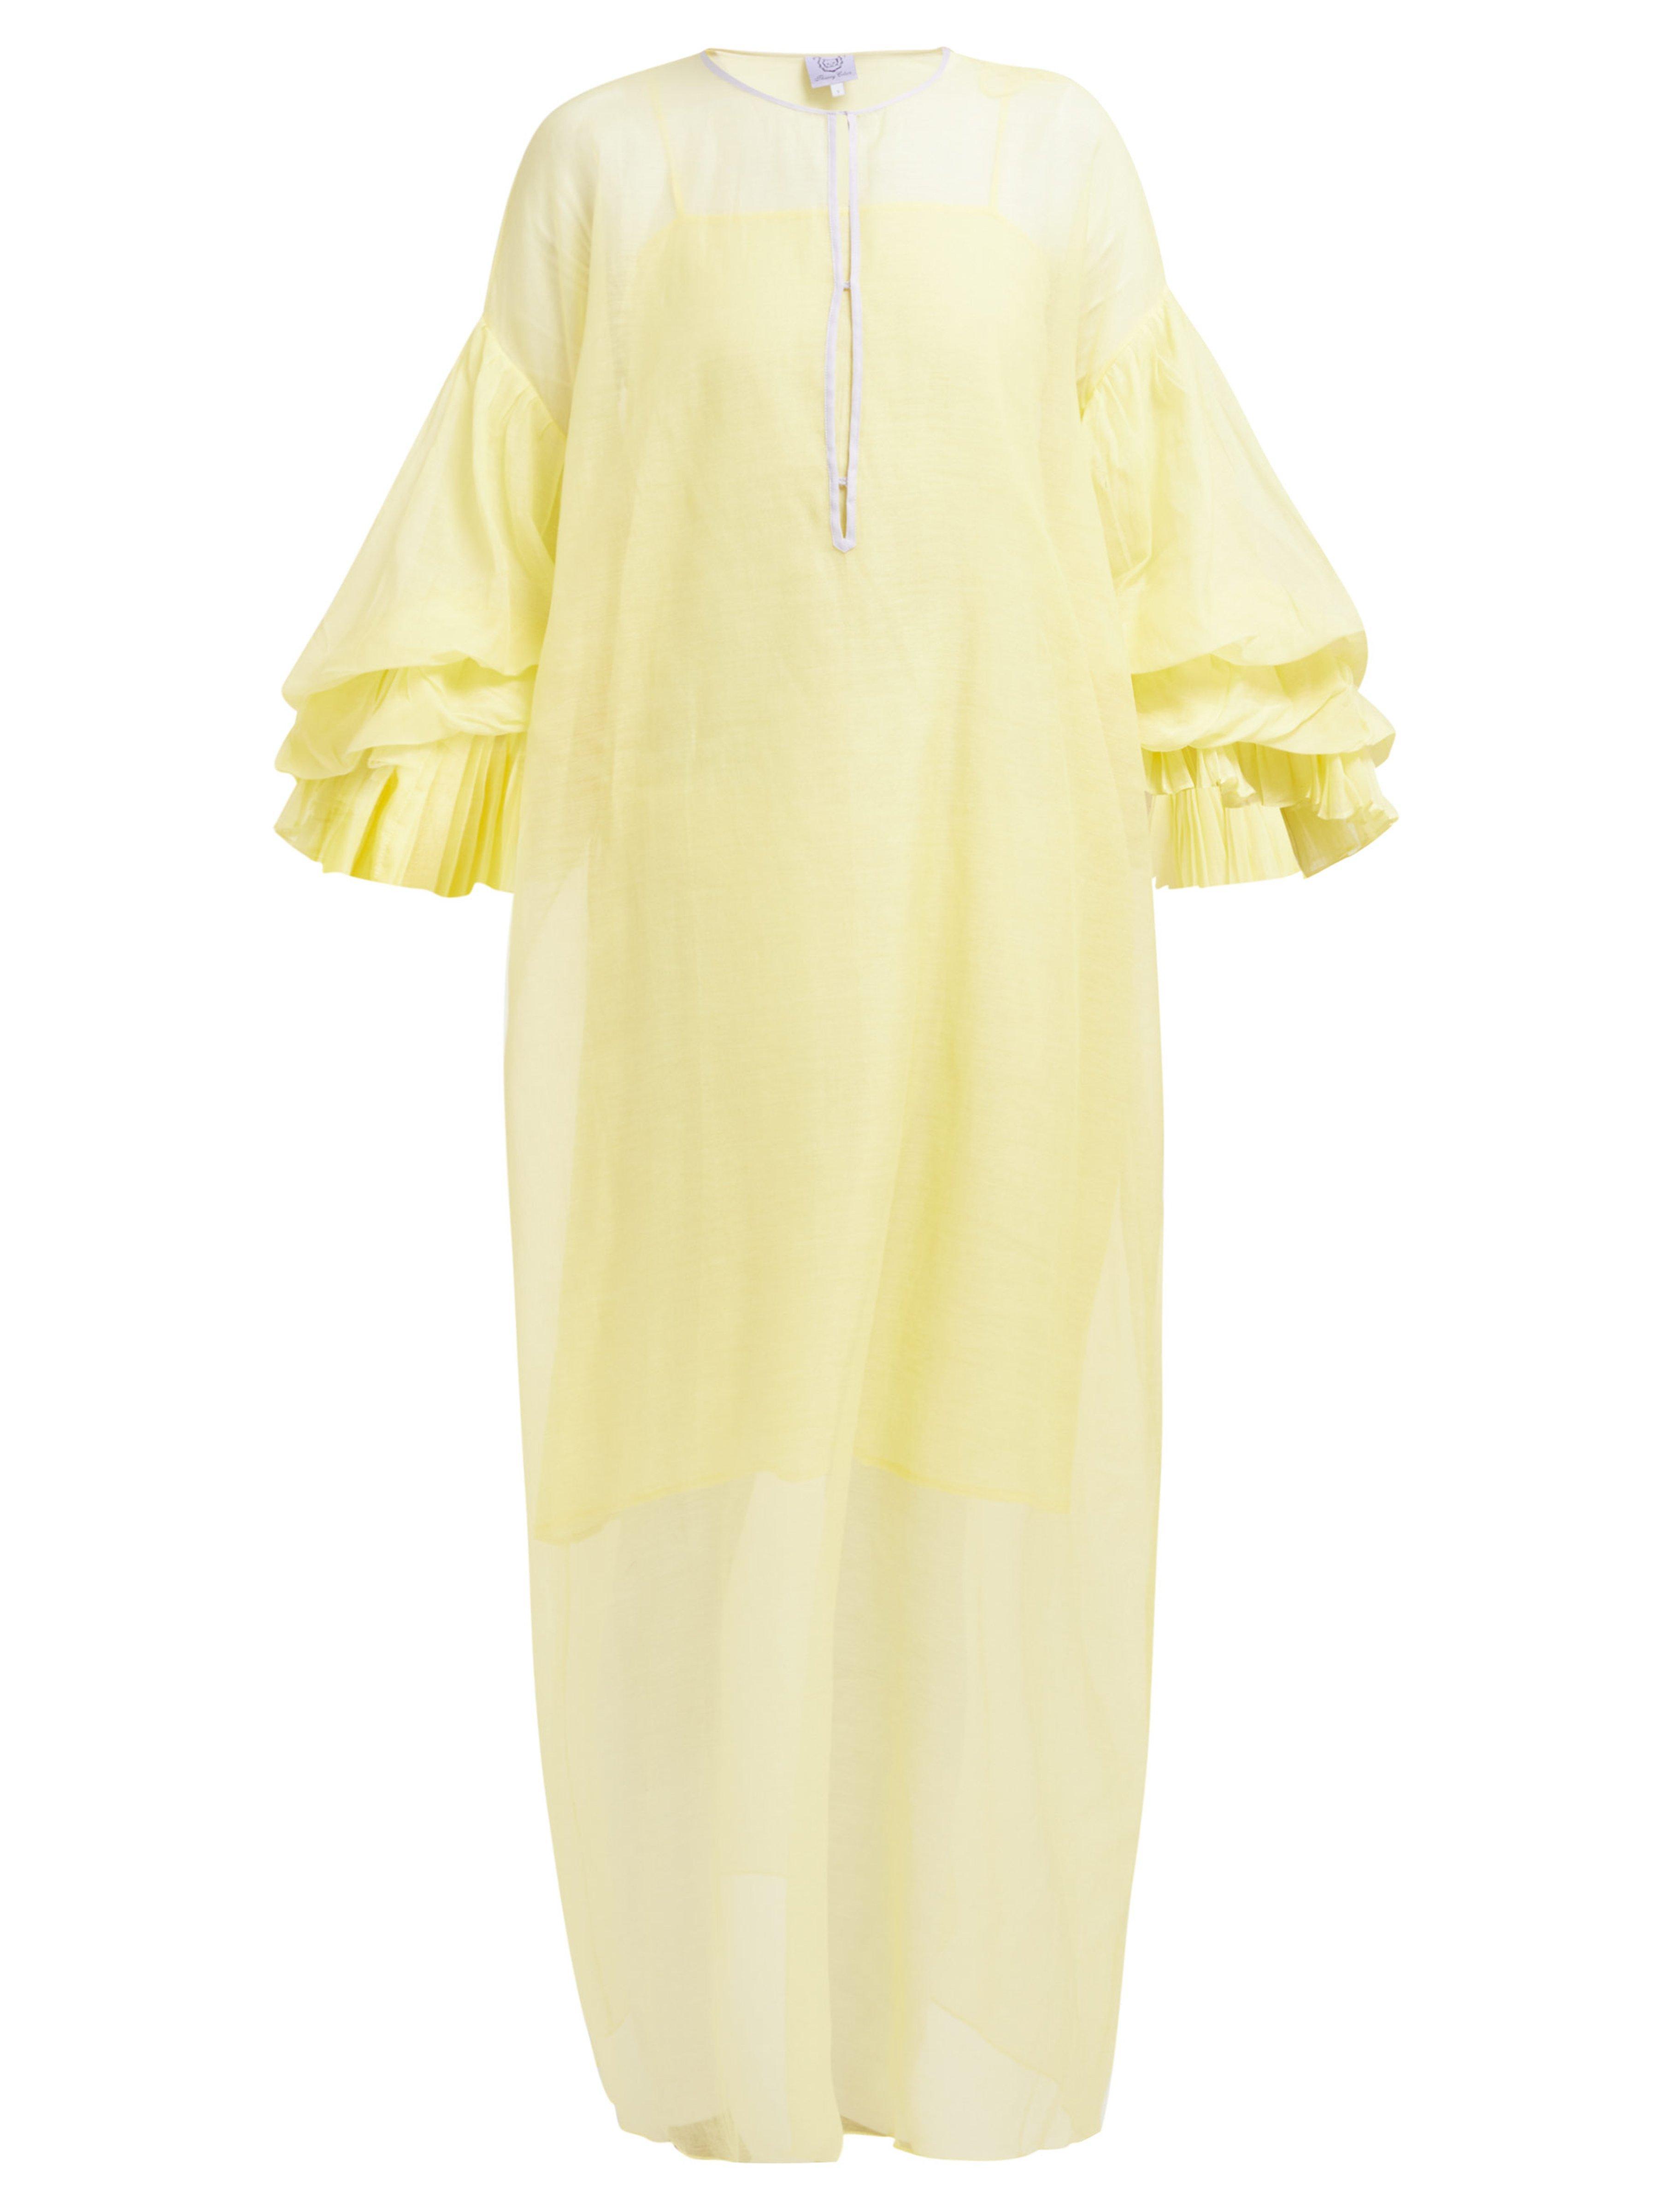 7956ff70bb Thierry Colson Tahara Cotton Blend Kaftan in Yellow - Lyst